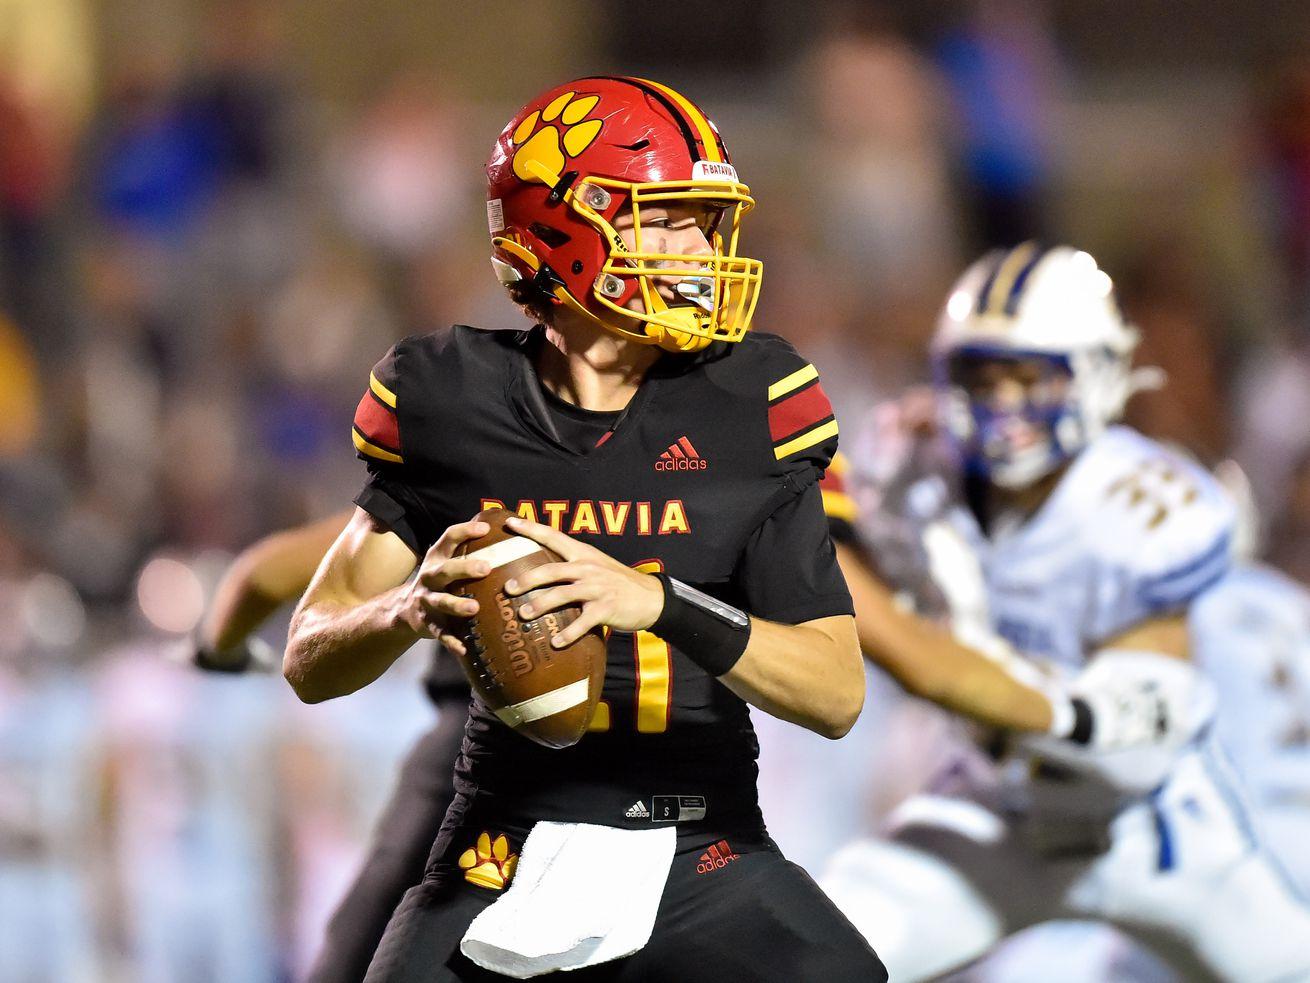 Batavia's Ryan Boe (21) passes the ball during the game against Wheaton North.